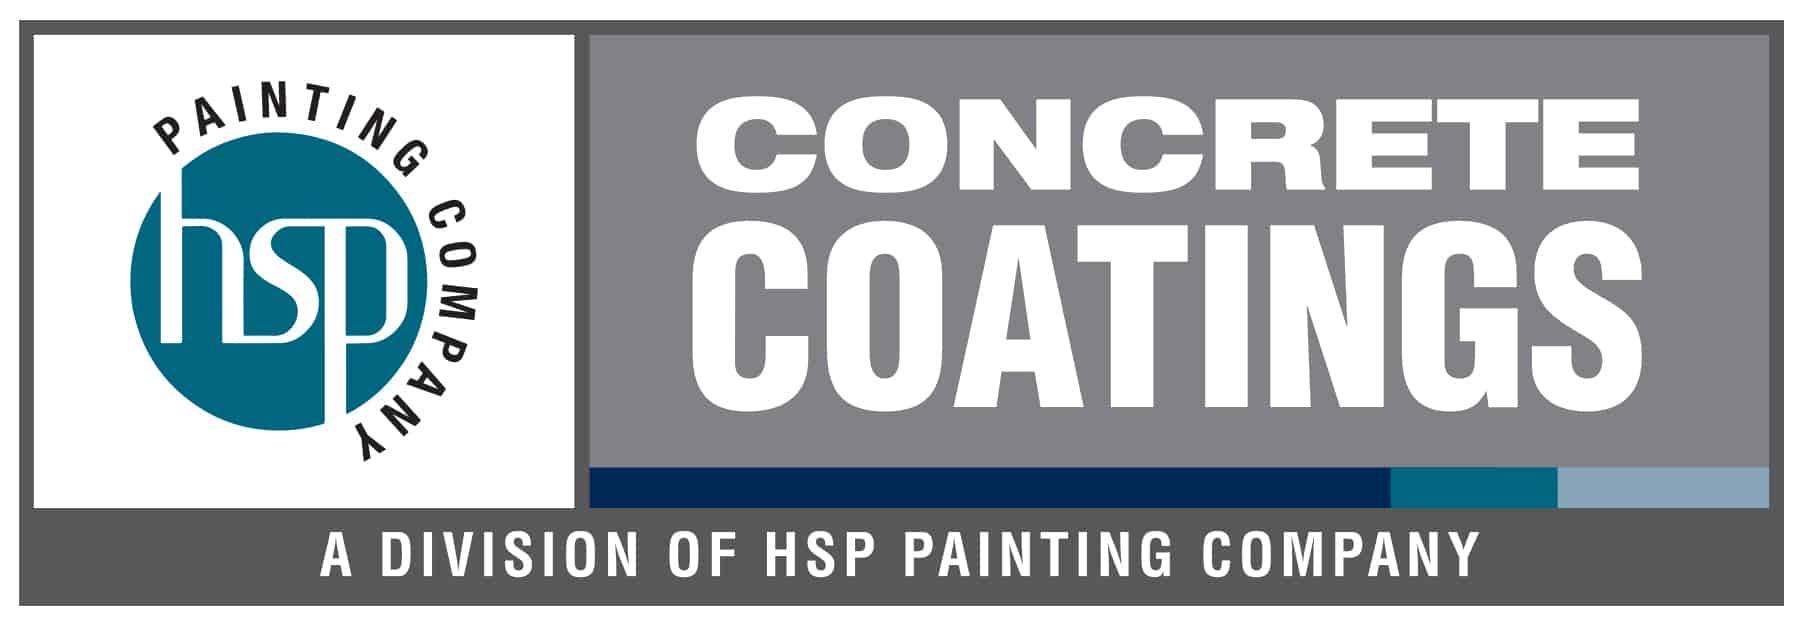 HSP Concrete Coatings